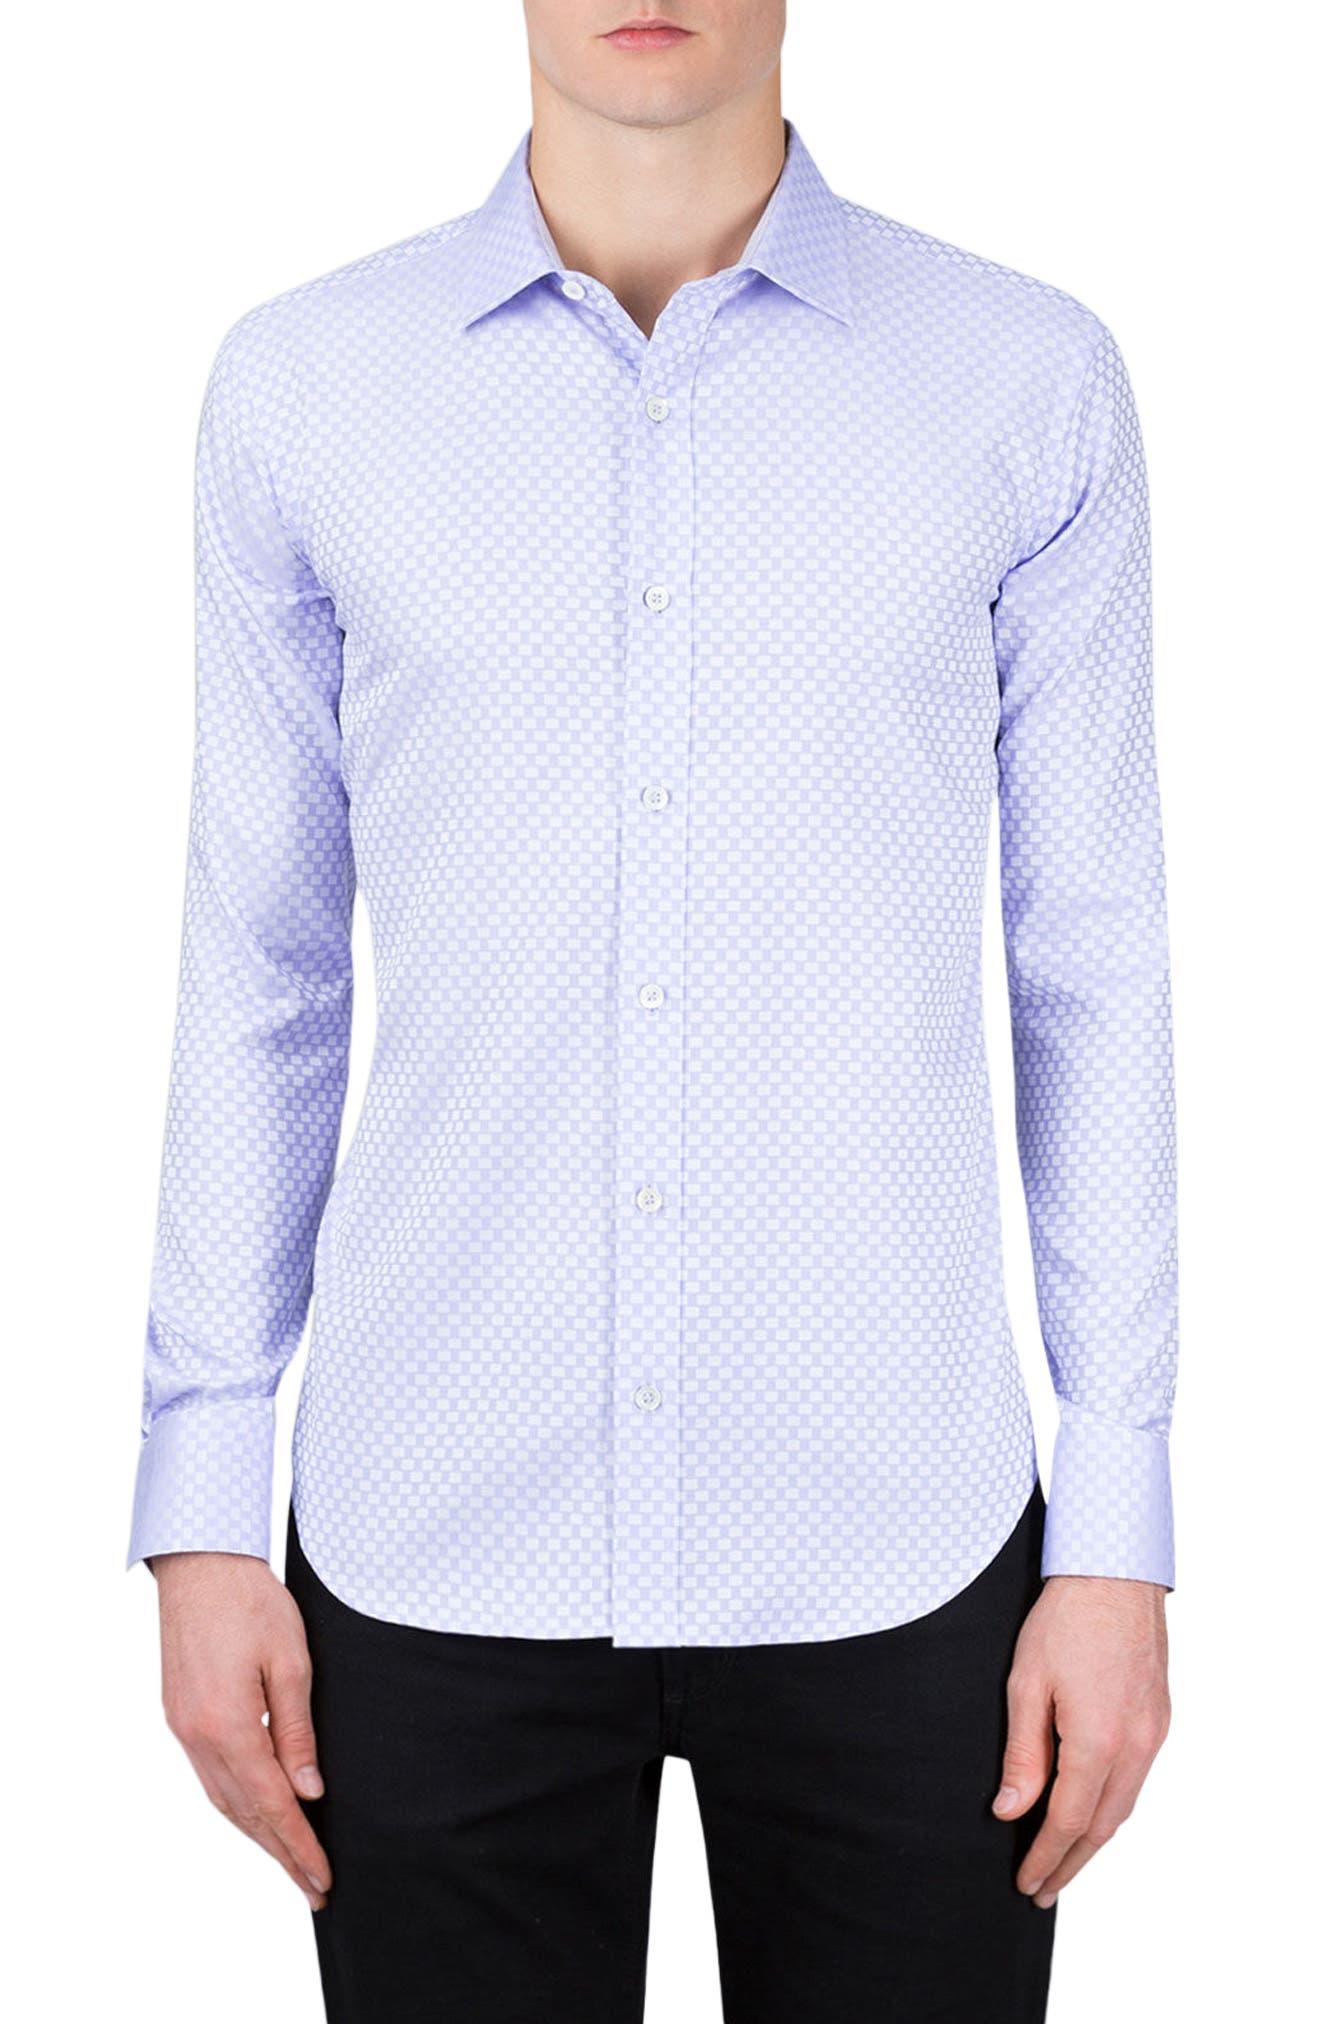 Main Image - Bugatchi Shaped Fit Rectangle Jacquard Sport Shirt